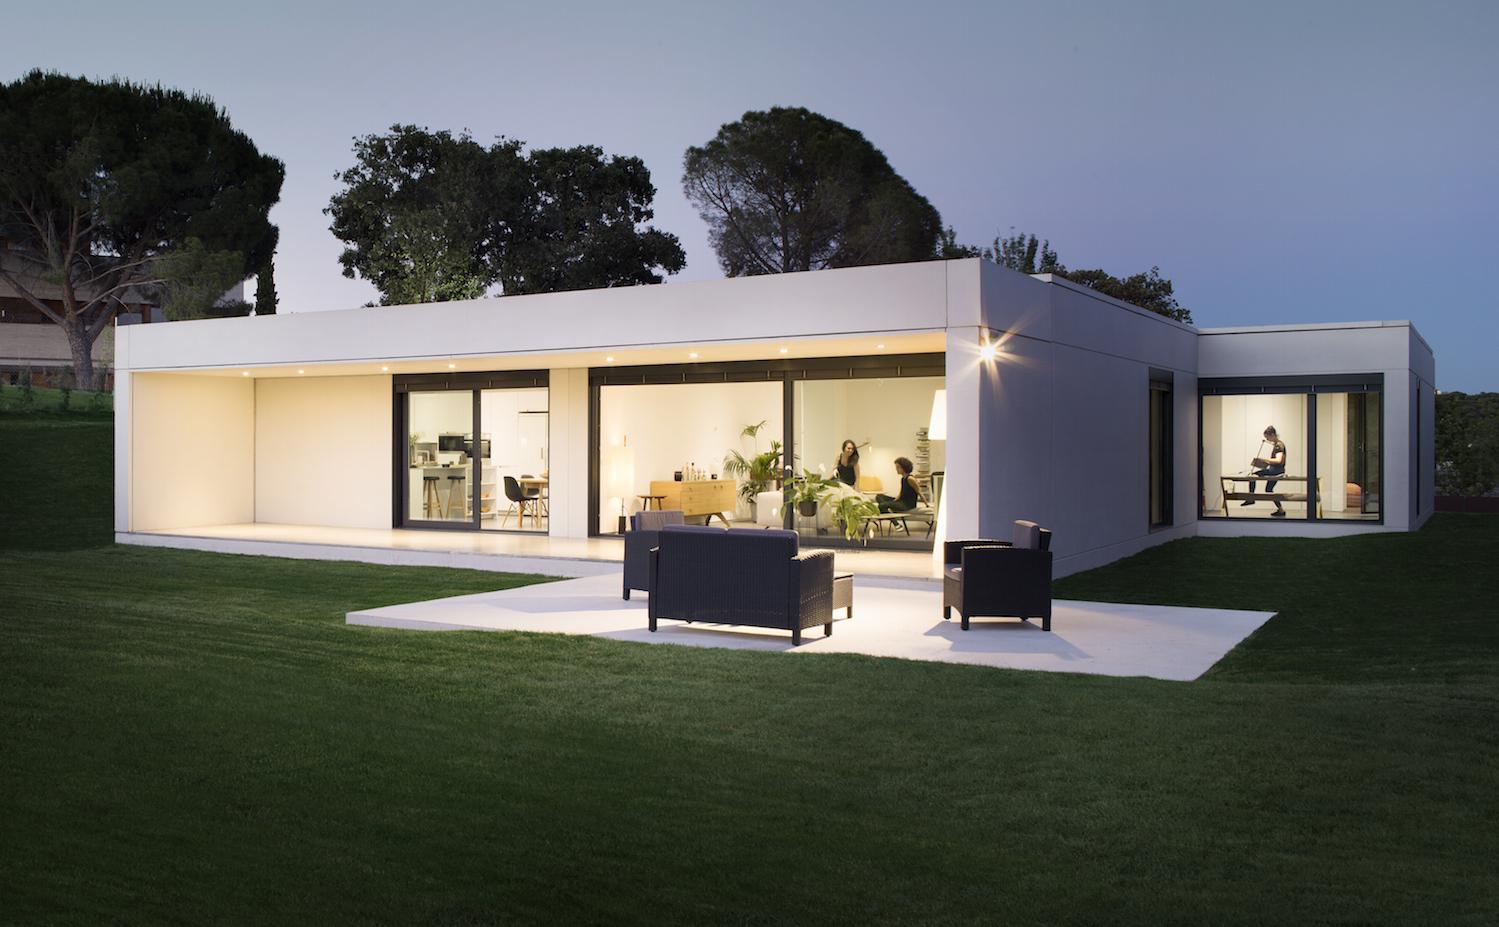 Casa prefabricada de dise o en las rozas madrid de homm for Disenos de casas prefabricadas modernas